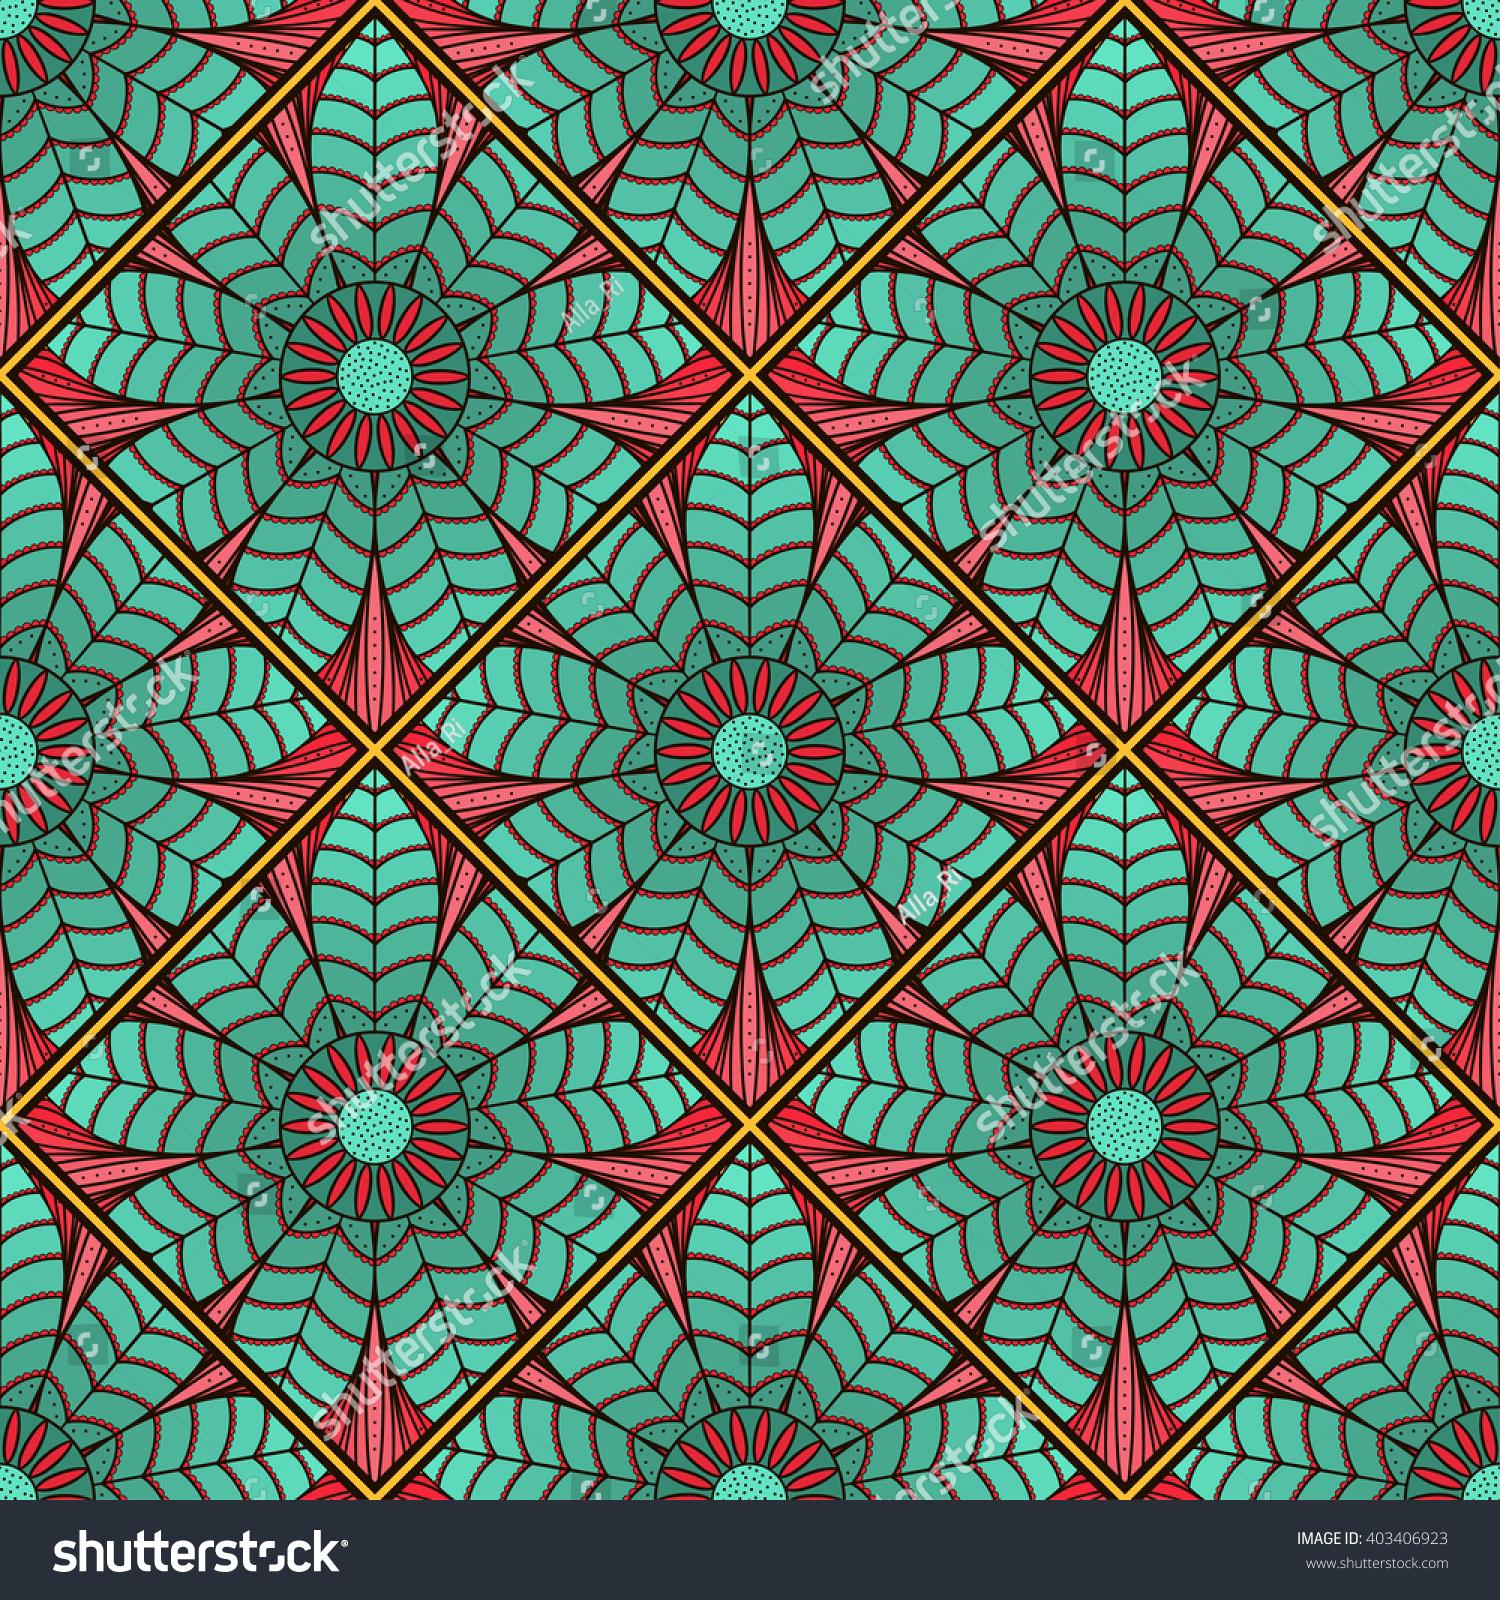 Mosaic Pattern Lotus Flower Endless Texture Stock Illustration